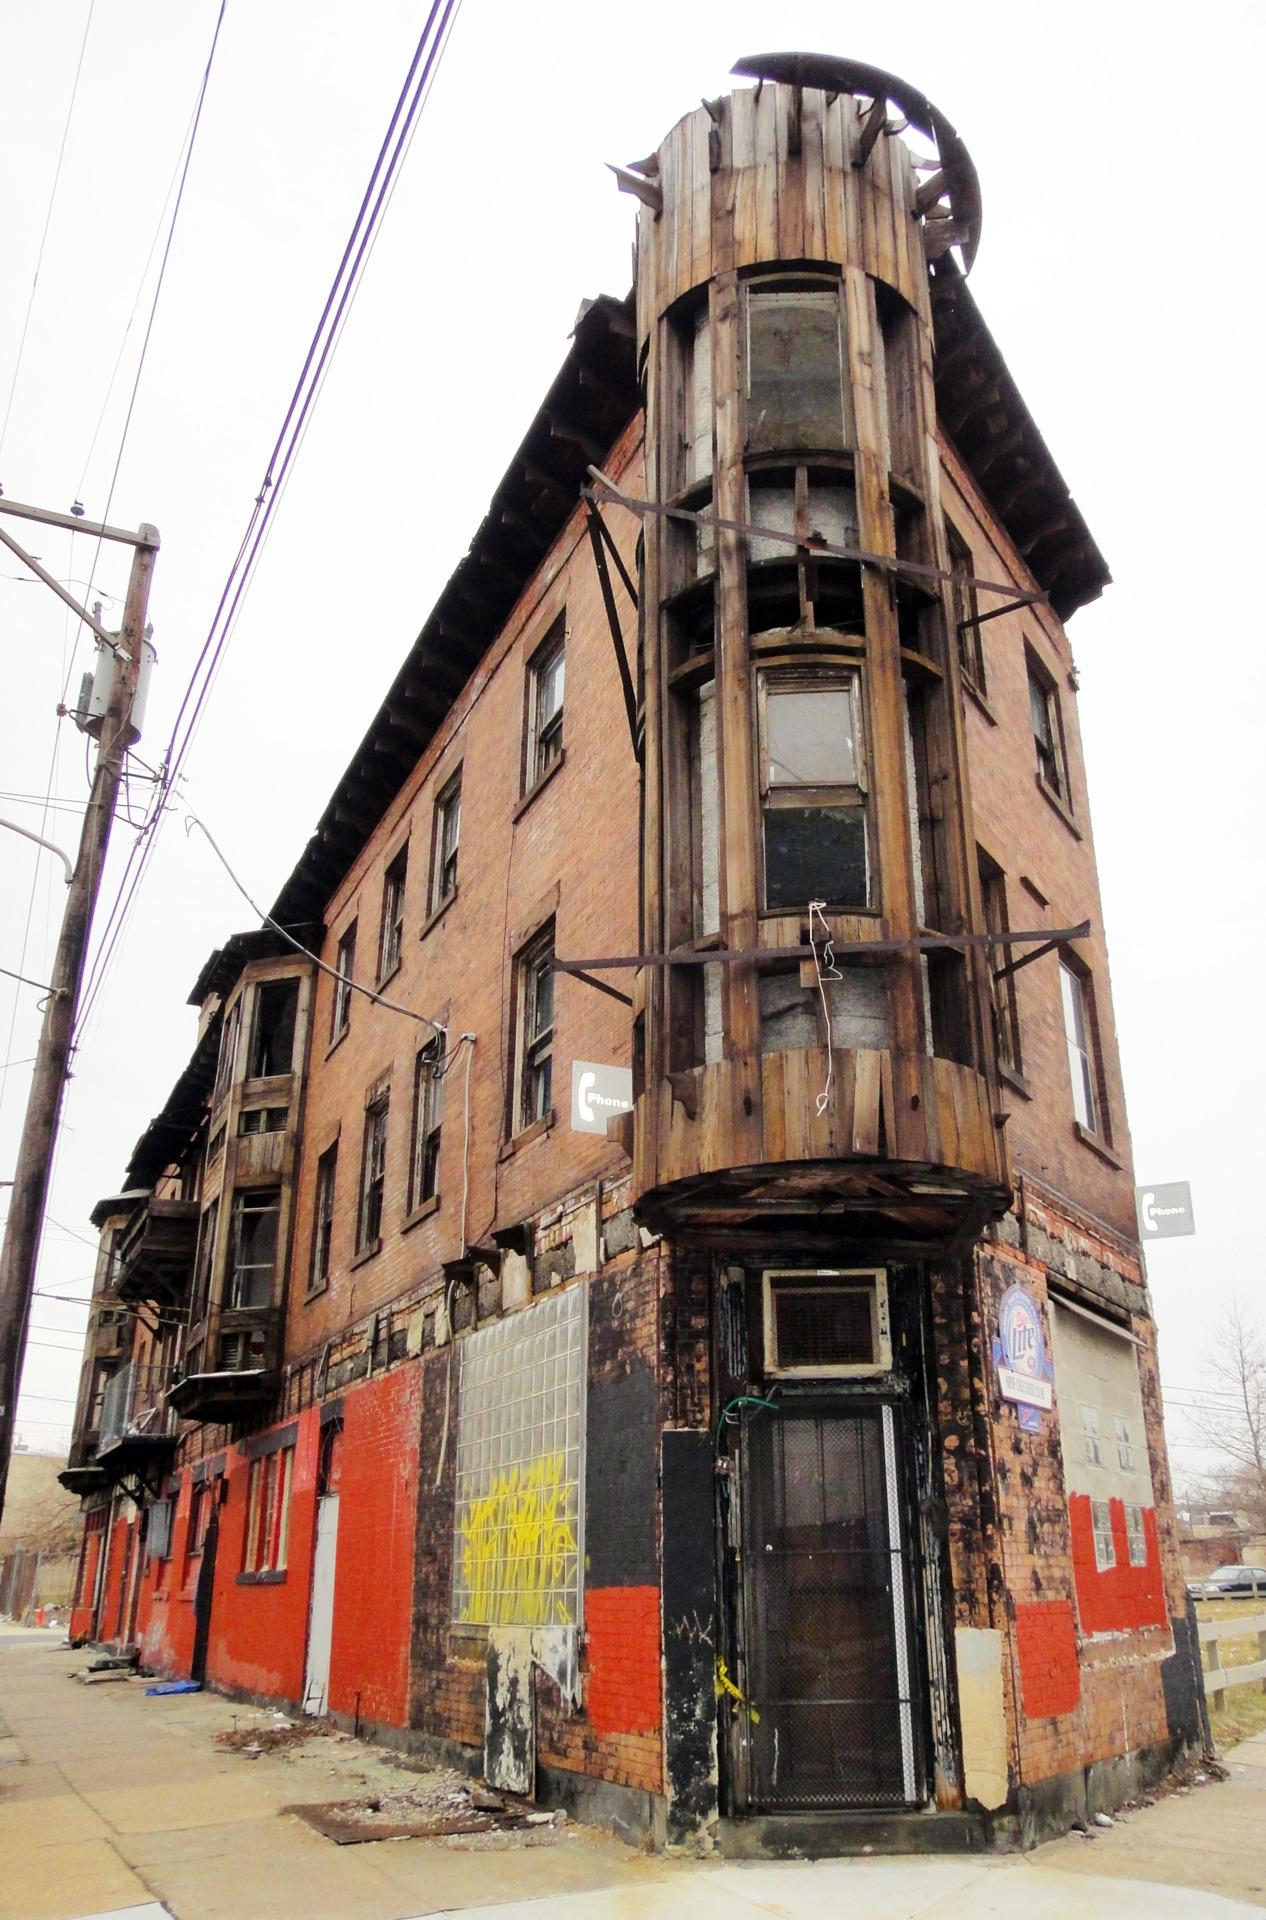 Urban Renewal in Philadelphia